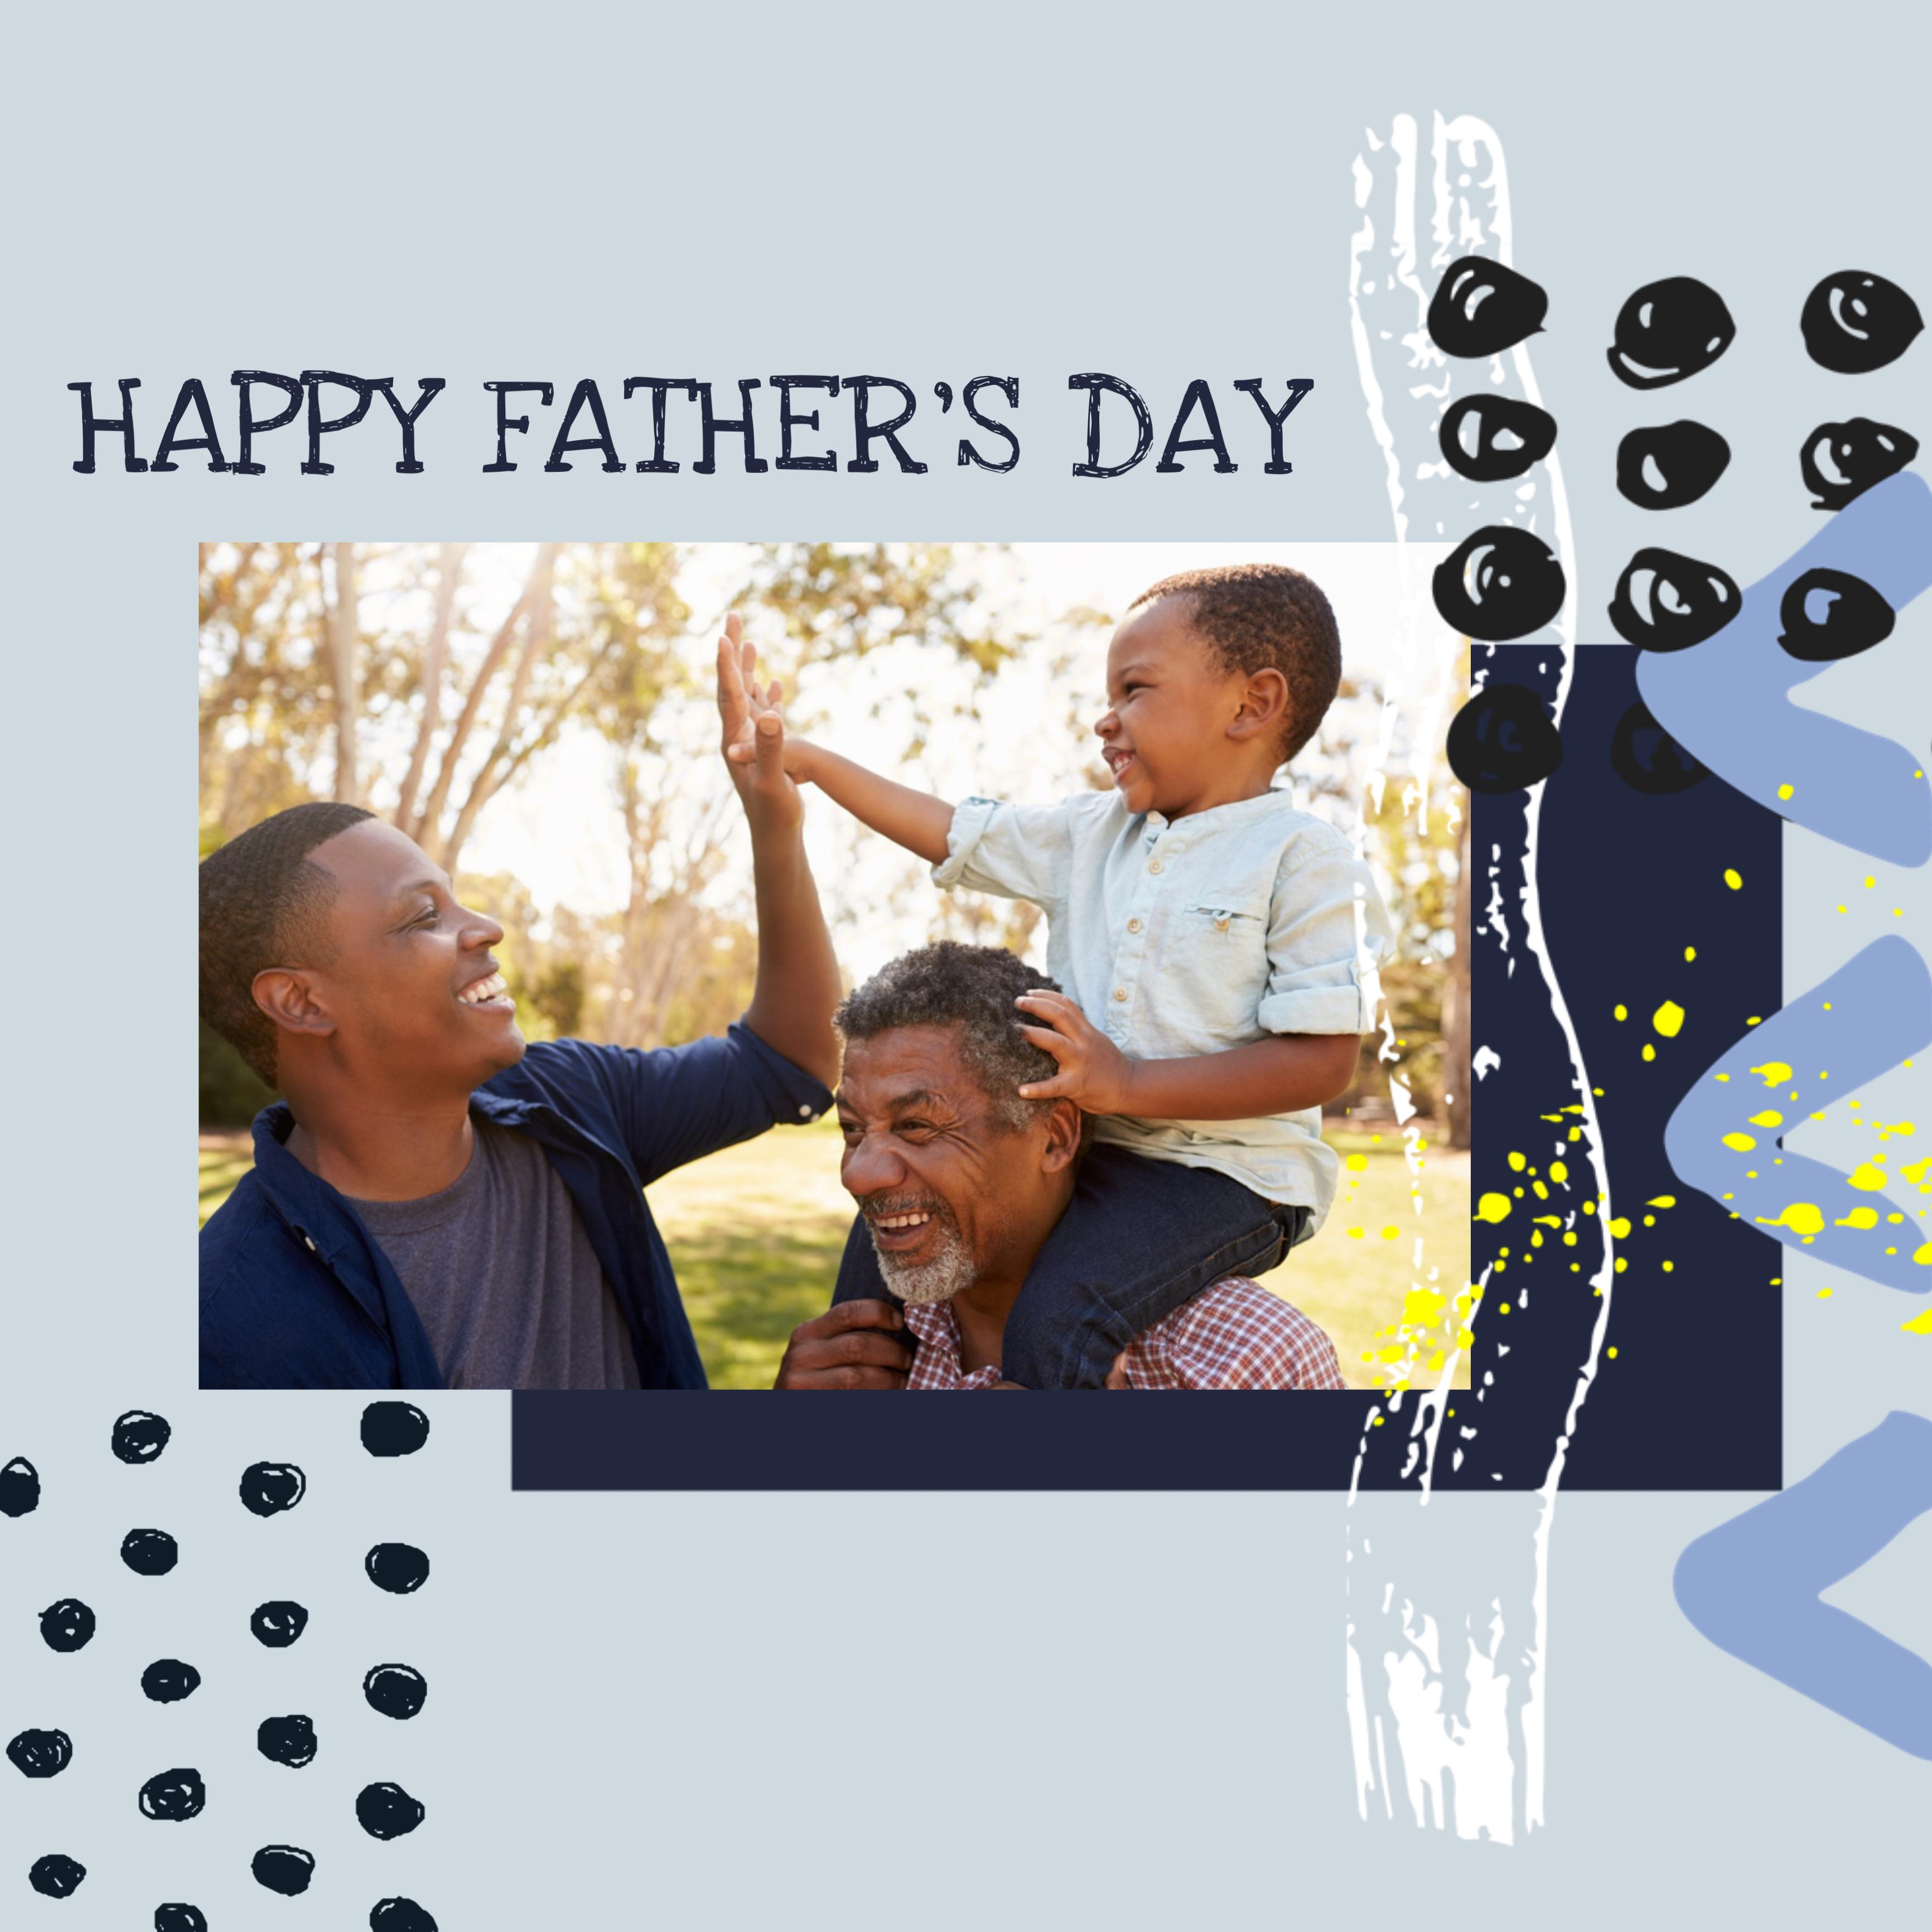 #freetoedit #fathersday #happyfathersday #dad #lovedad